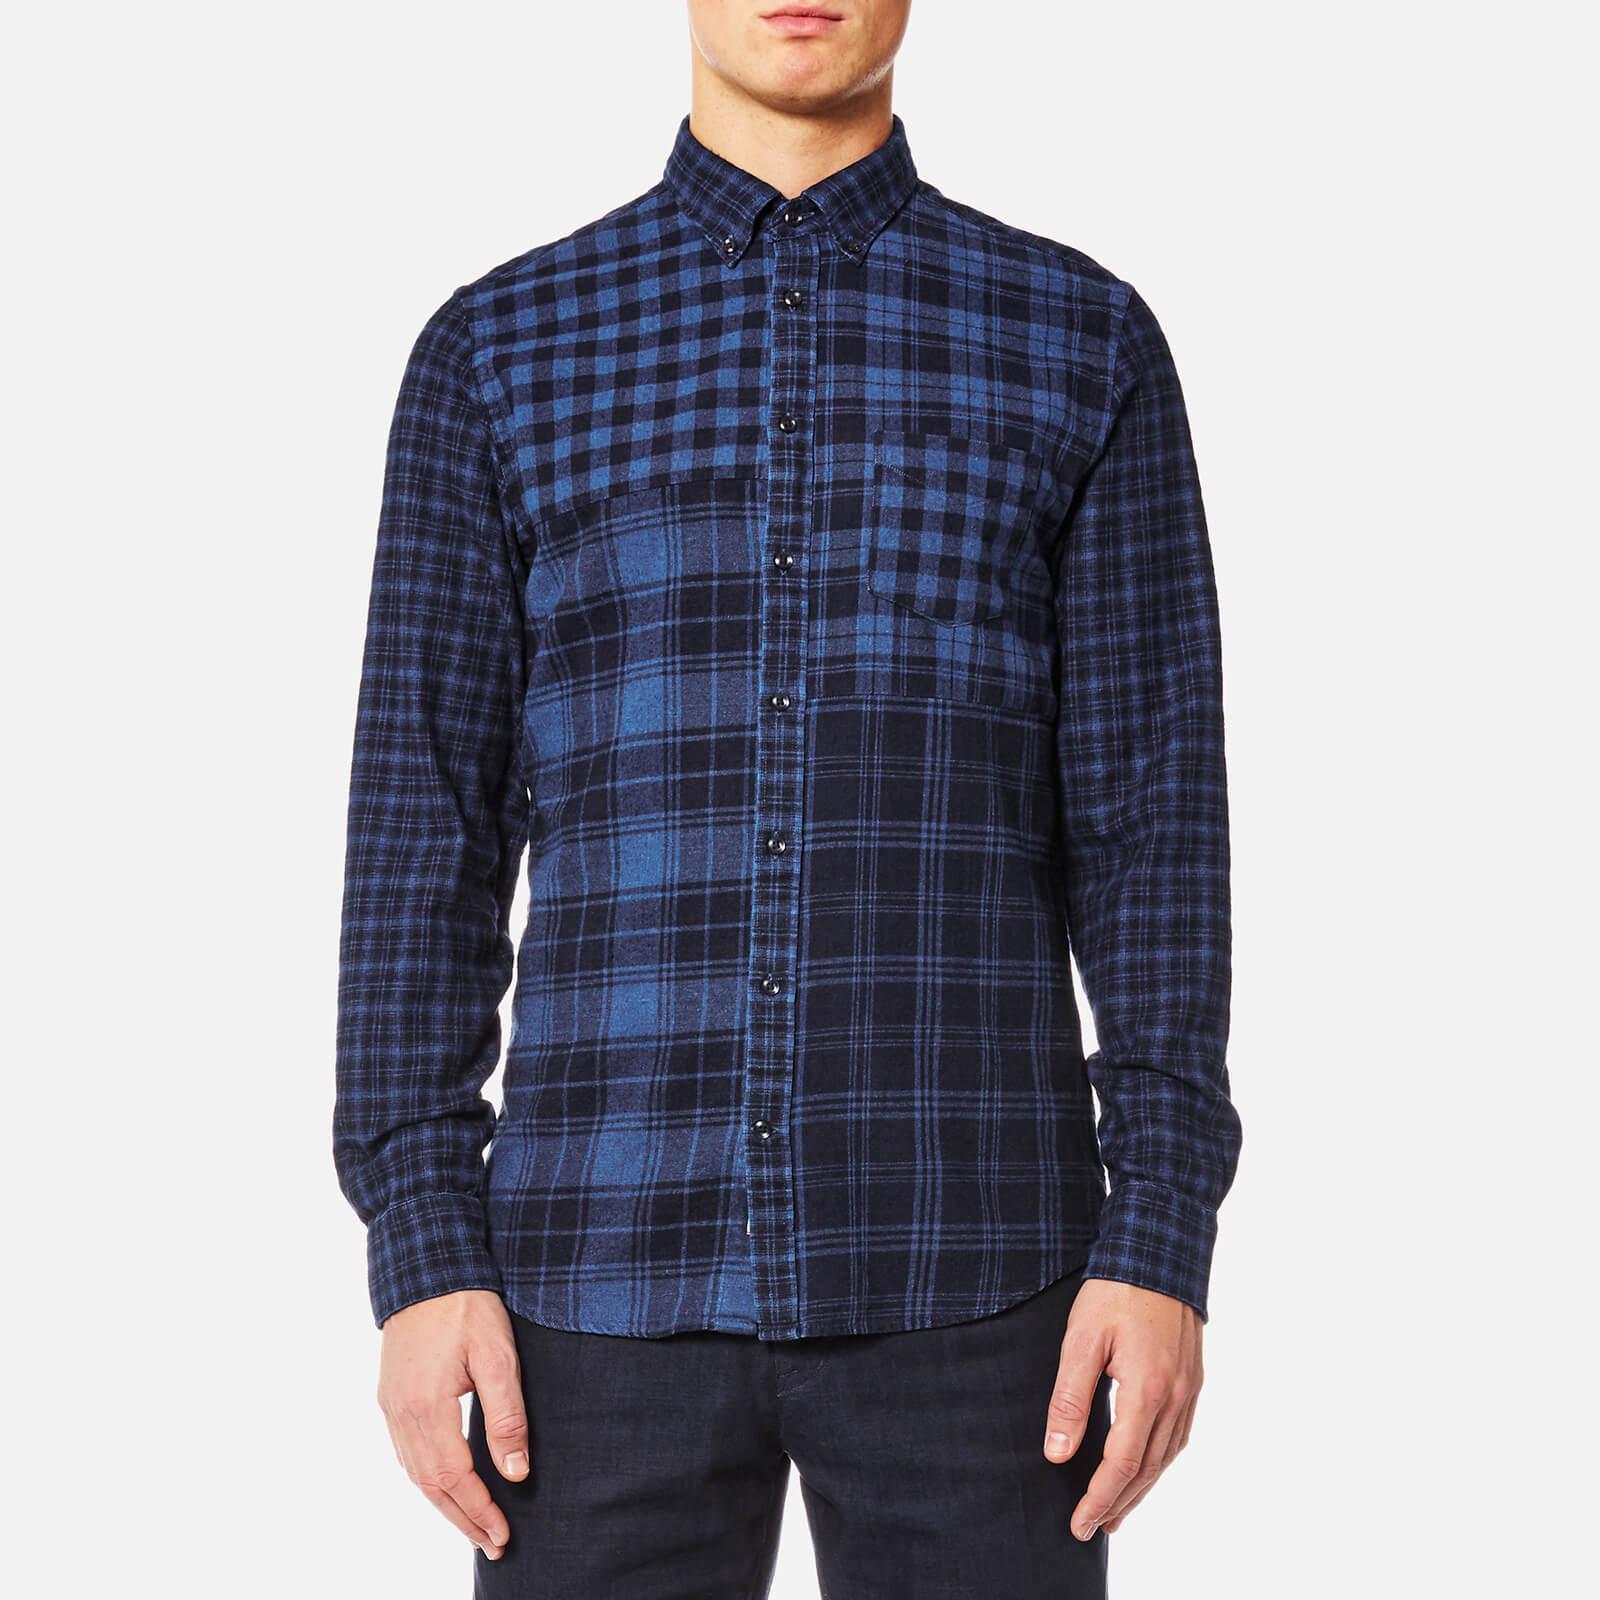 1e01bd41 Tommy Hilfiger Men's Checked Patchwork Long Sleeve Shirt - Indigo Mens  Clothing | TheHut.com